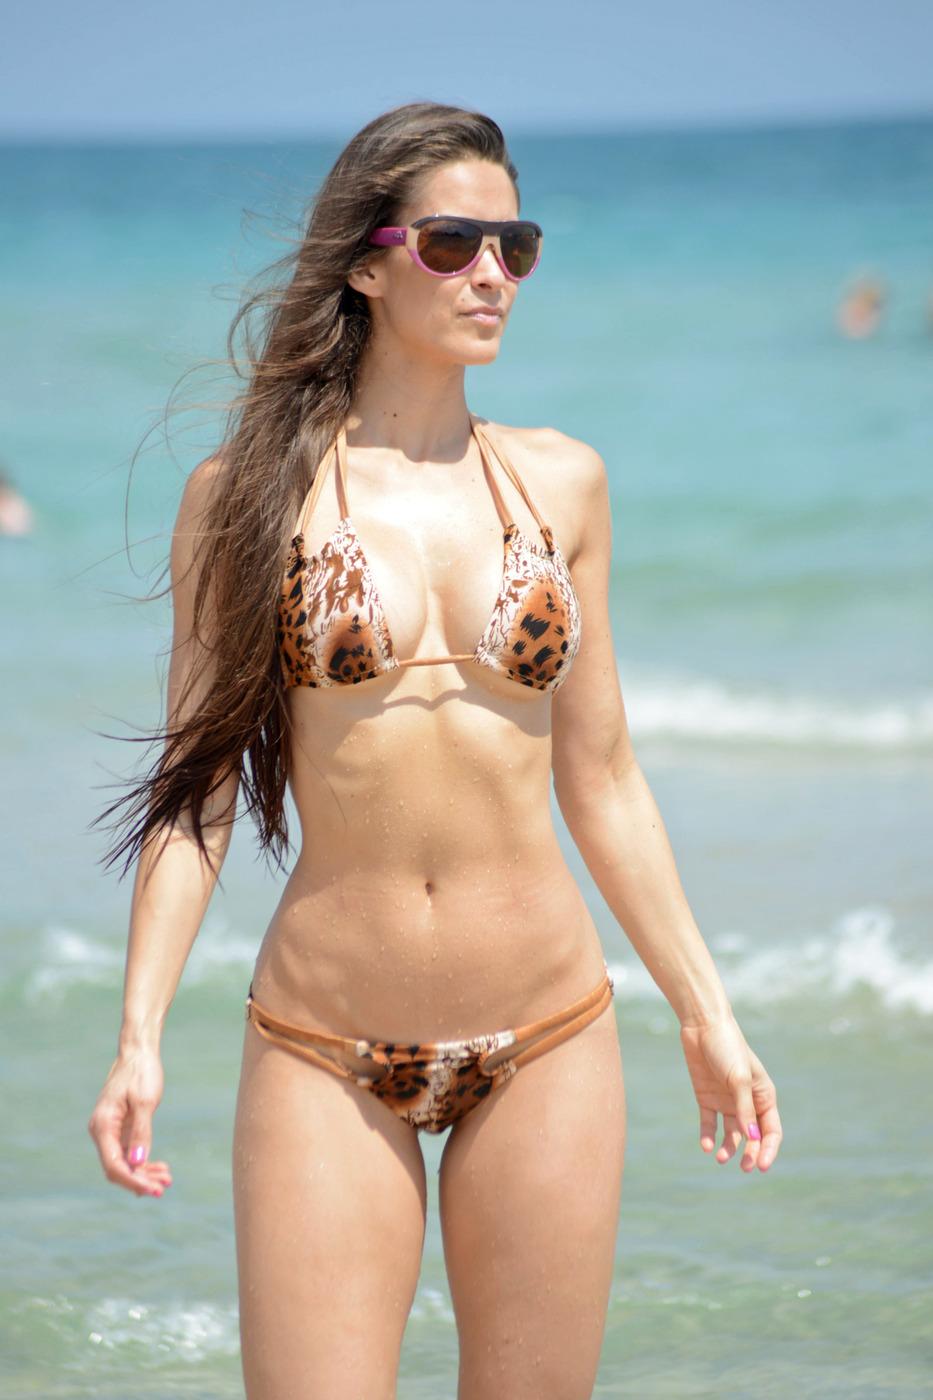 Anais Y Lili anais zanotti wearing a tiny bikini in miami | celebrity